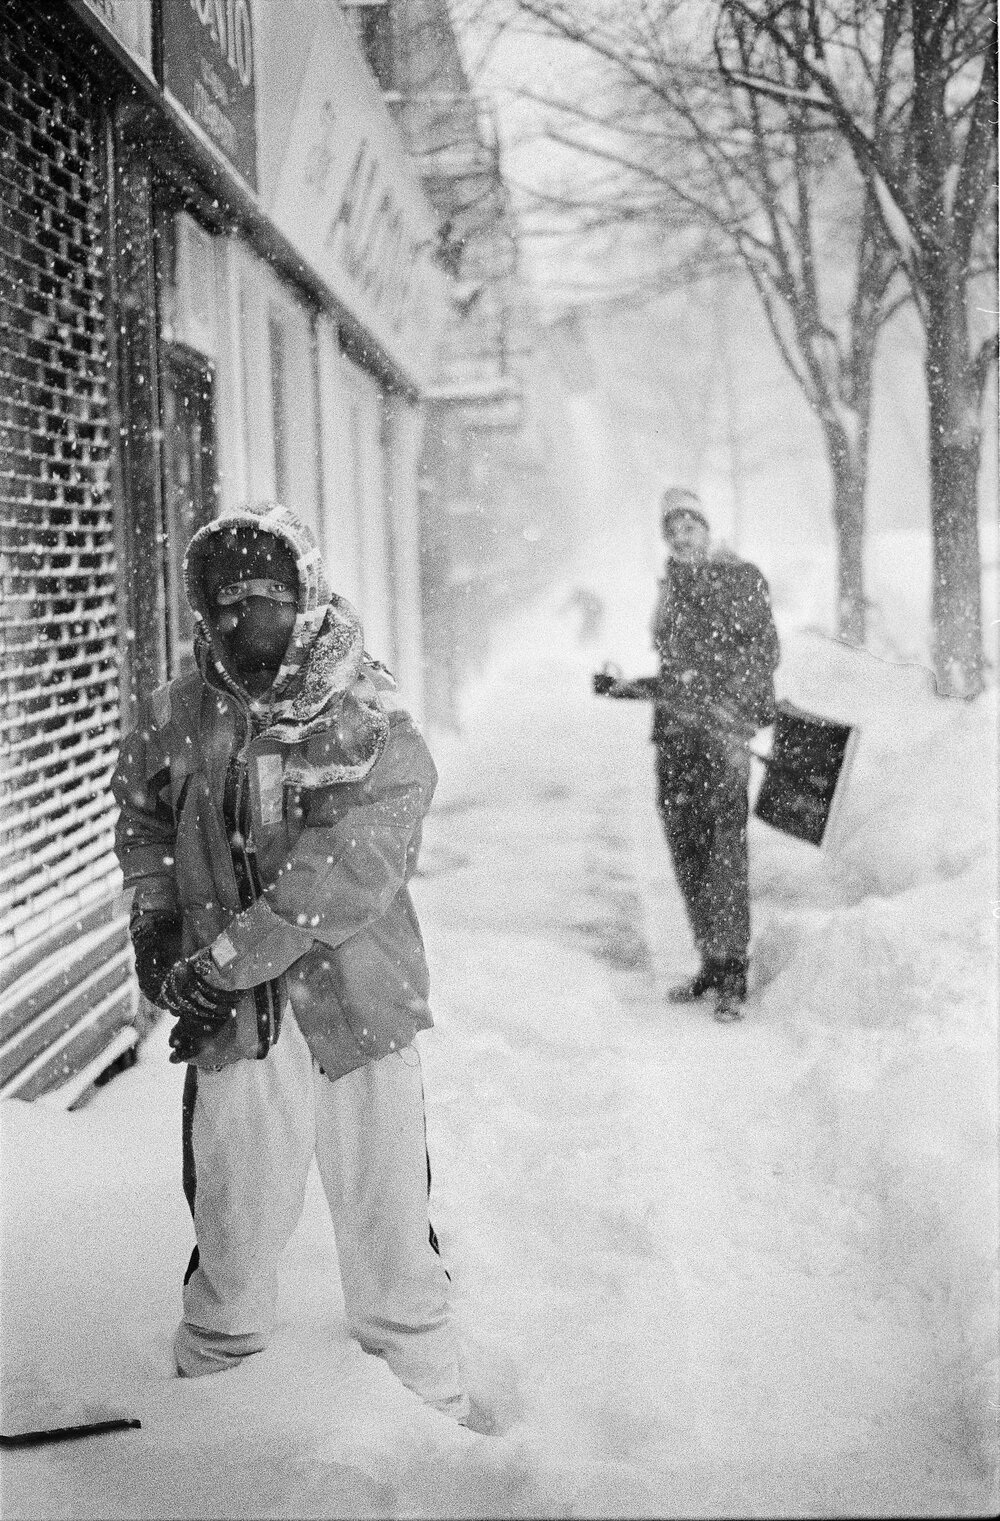 snow_shoveling_size_change.jpg